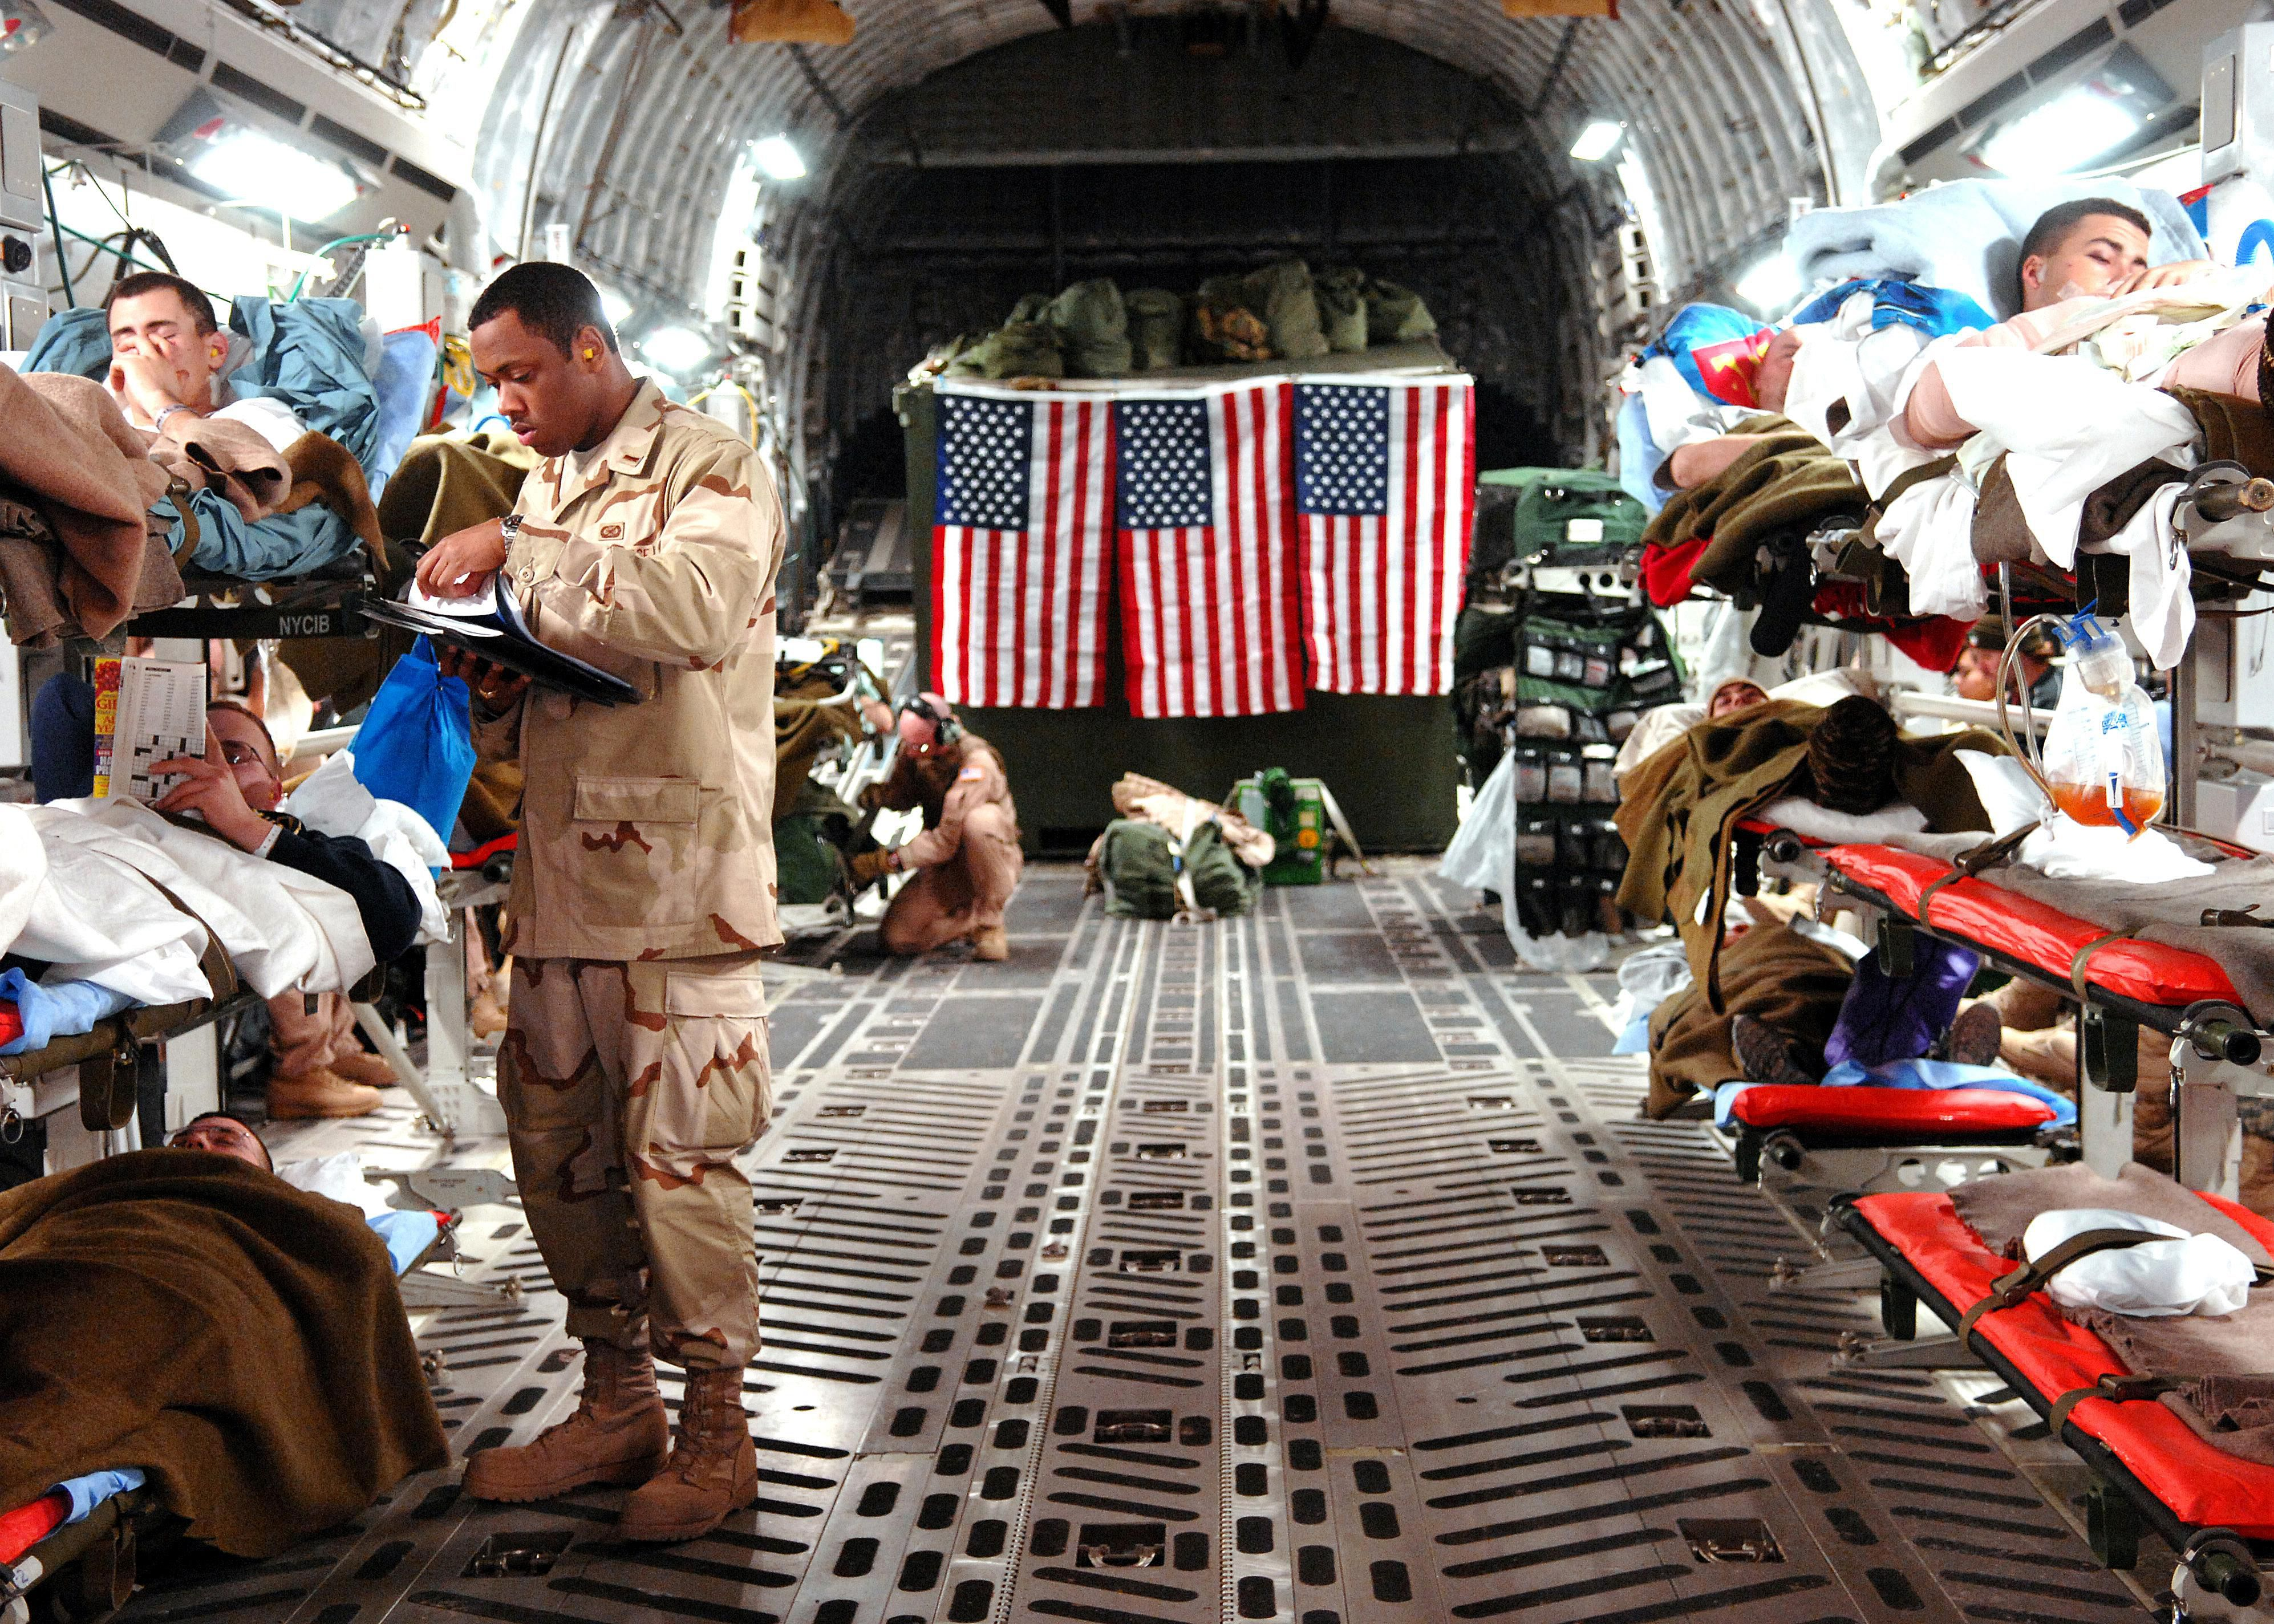 C-17_Medevac_mission,_Balad_AB,_Iraq.jpg